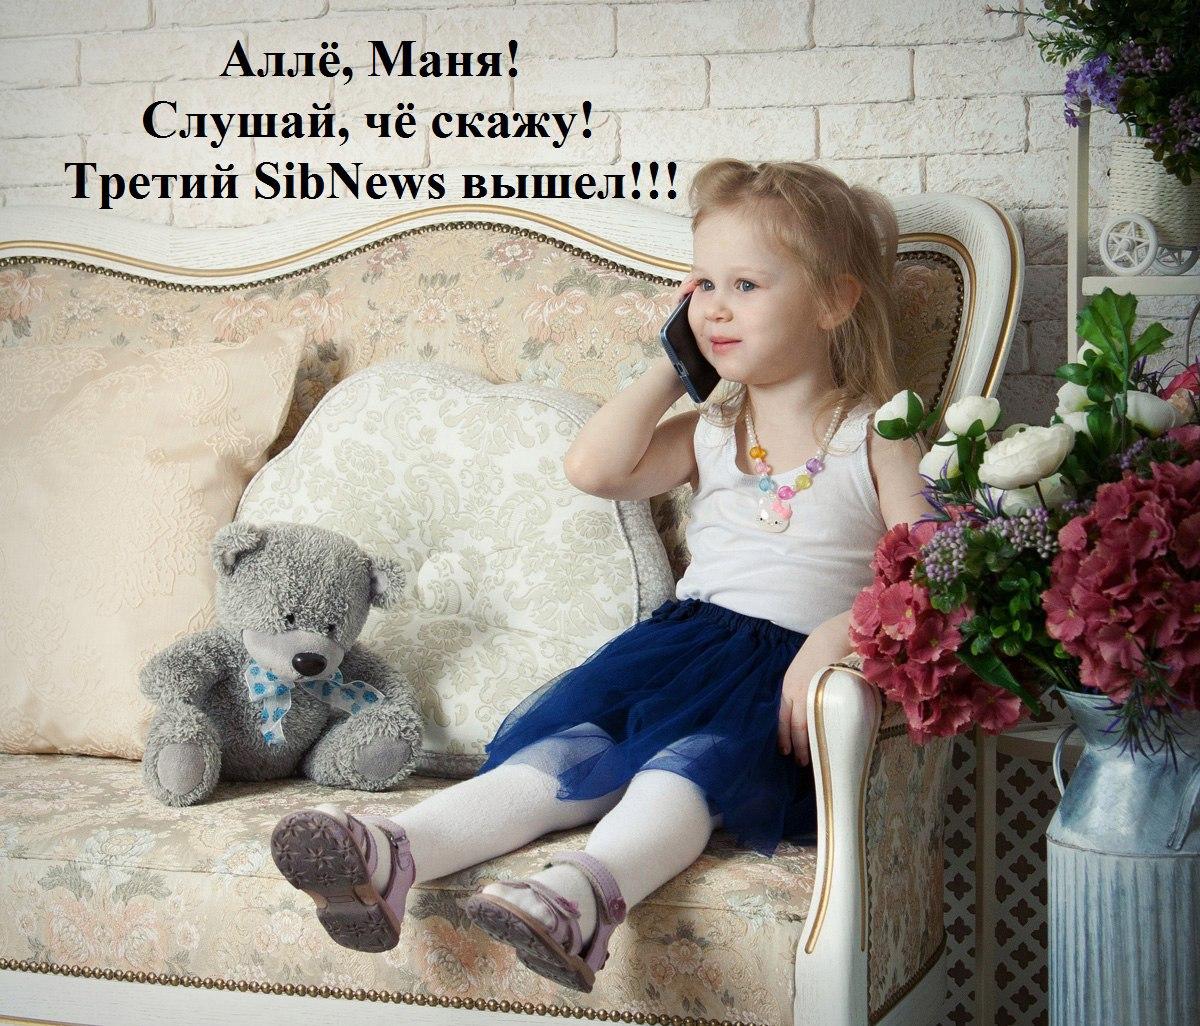 http://zxdemos.ru/img/posts/posts_20/37341.jpg